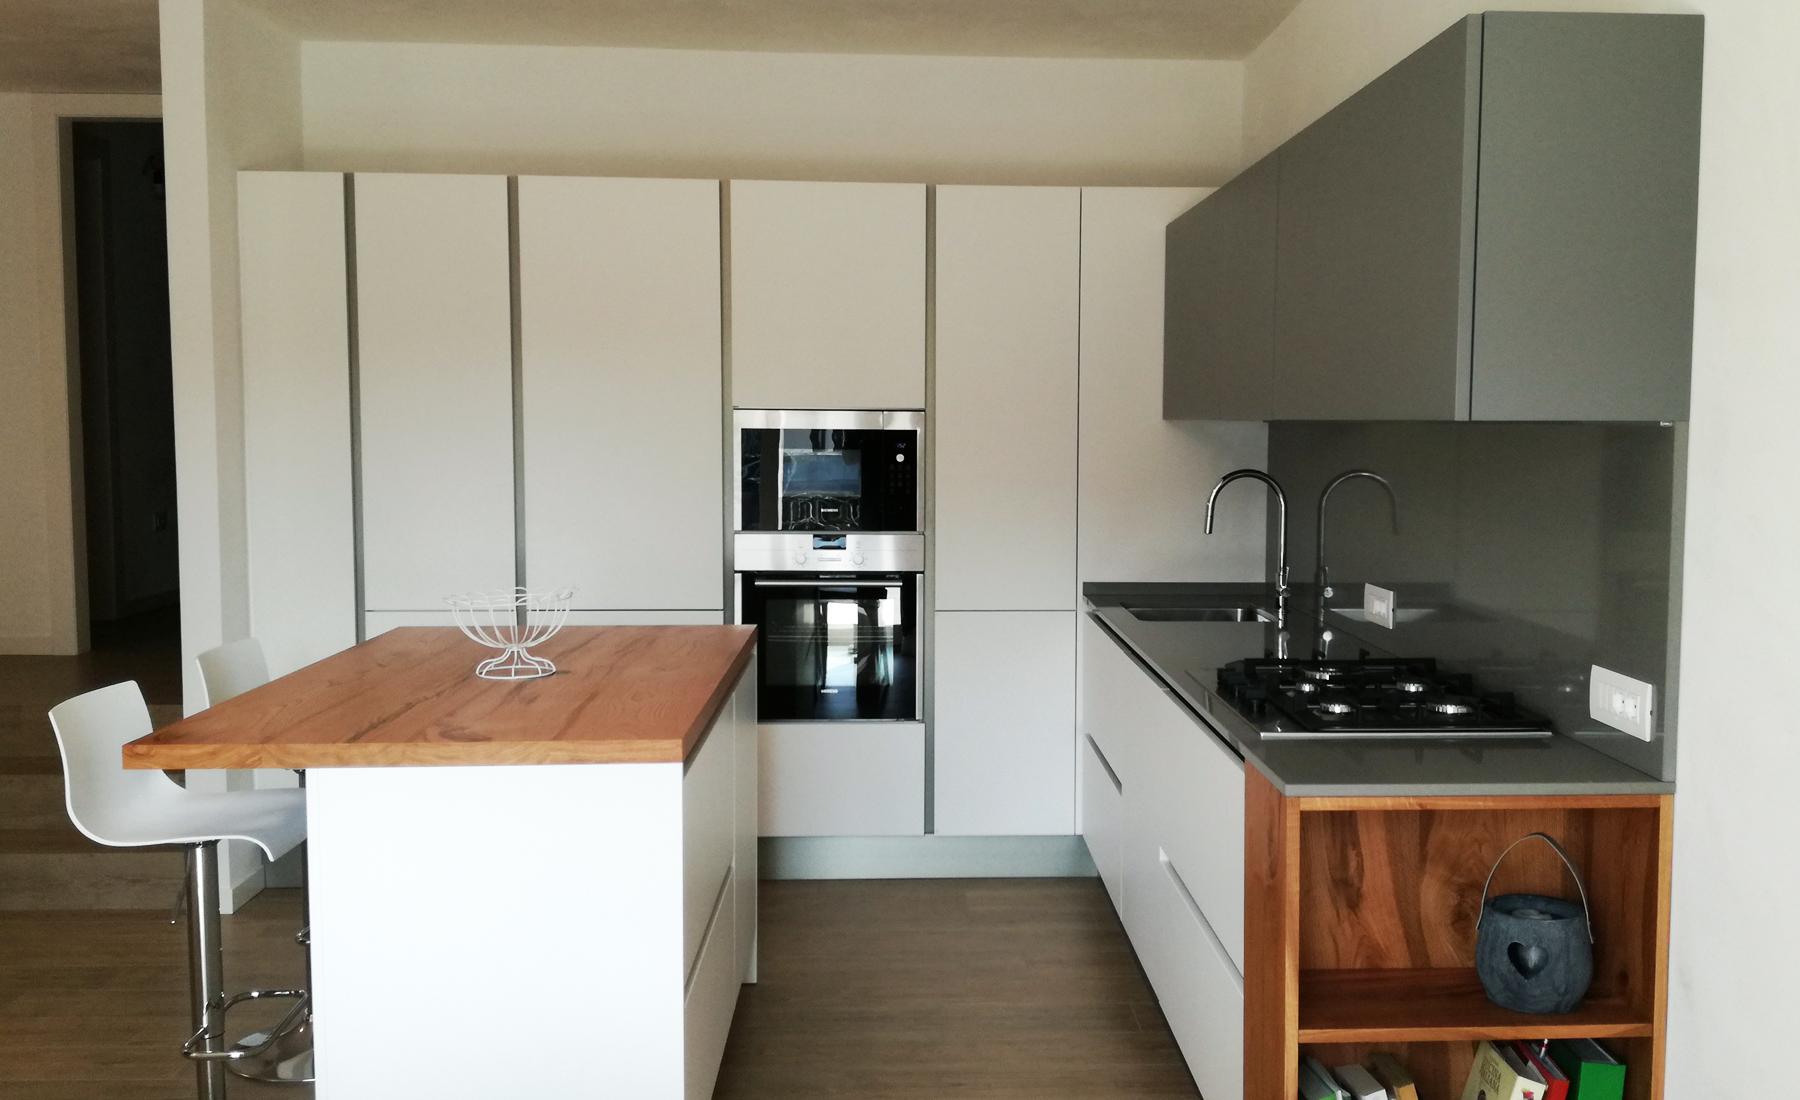 Paraschizzi cucina laterale. cucine moderne piccole con piano di